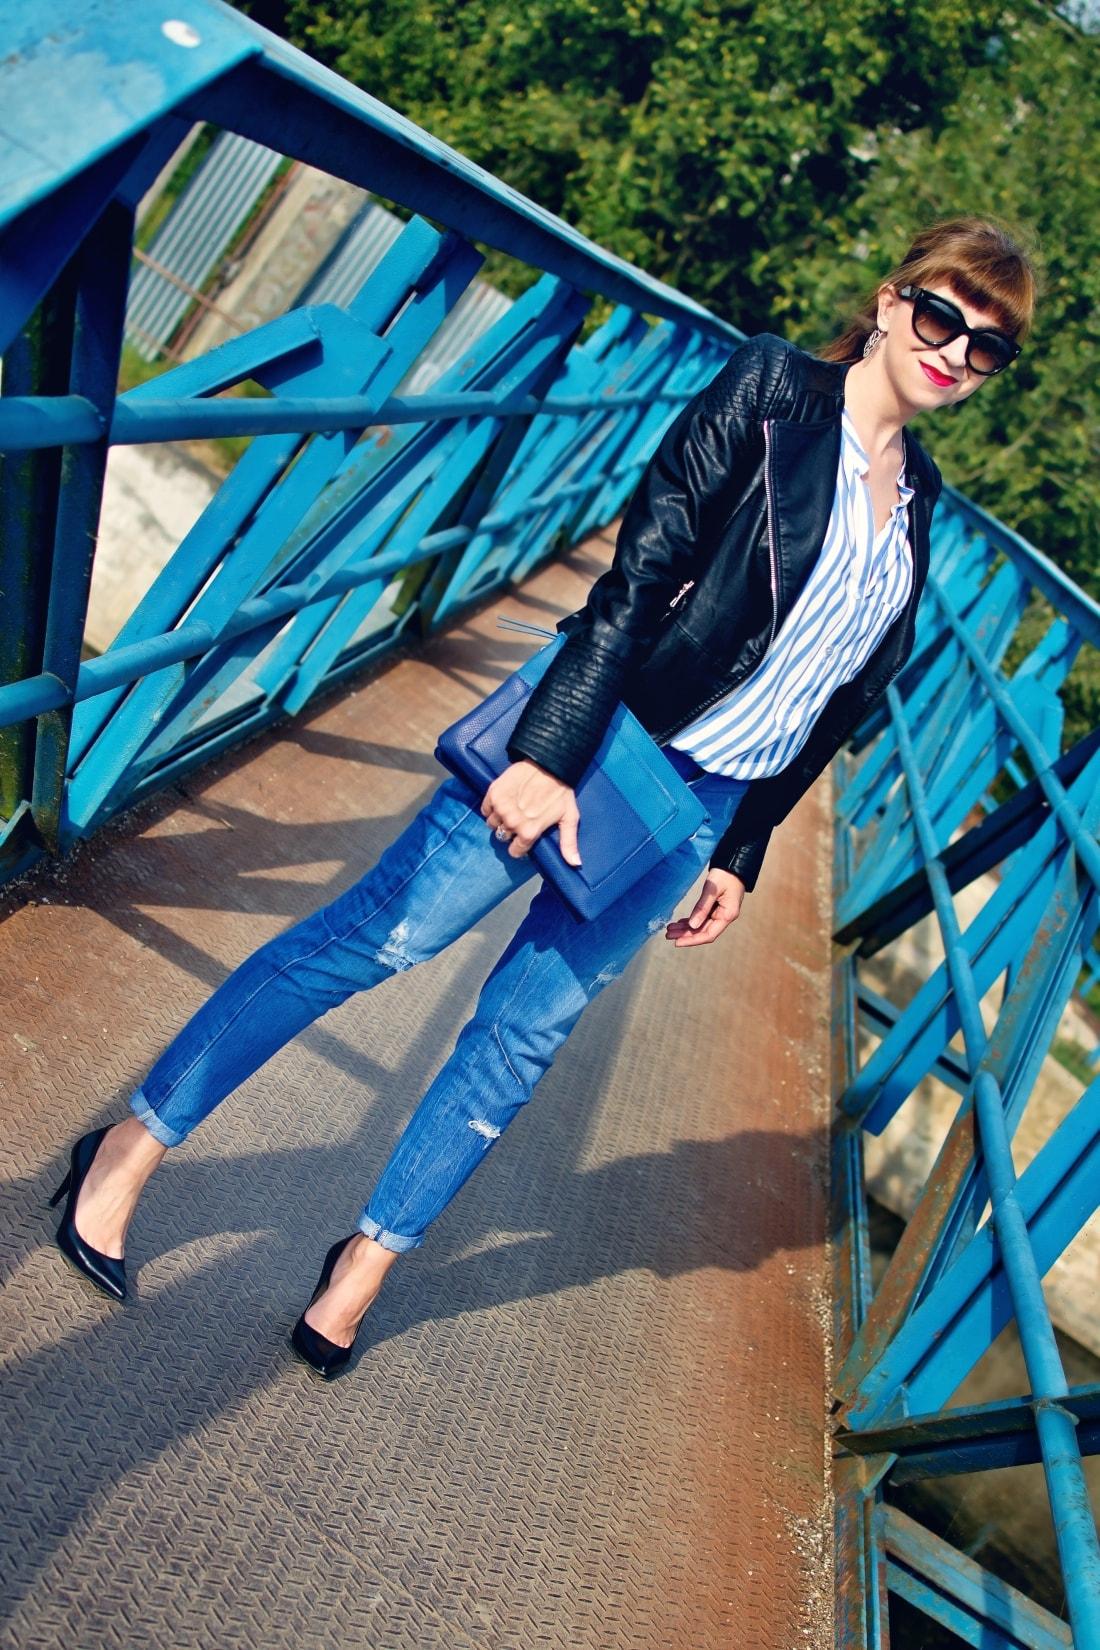 Move, move, move_Katharine-fashion is beautiful_1_Blog_Kožená bunda_Roztrhané džínsy_Prúžkovaná blúzka_Kabelka Parfois_Katarína Jakubčová_Fashion blogger